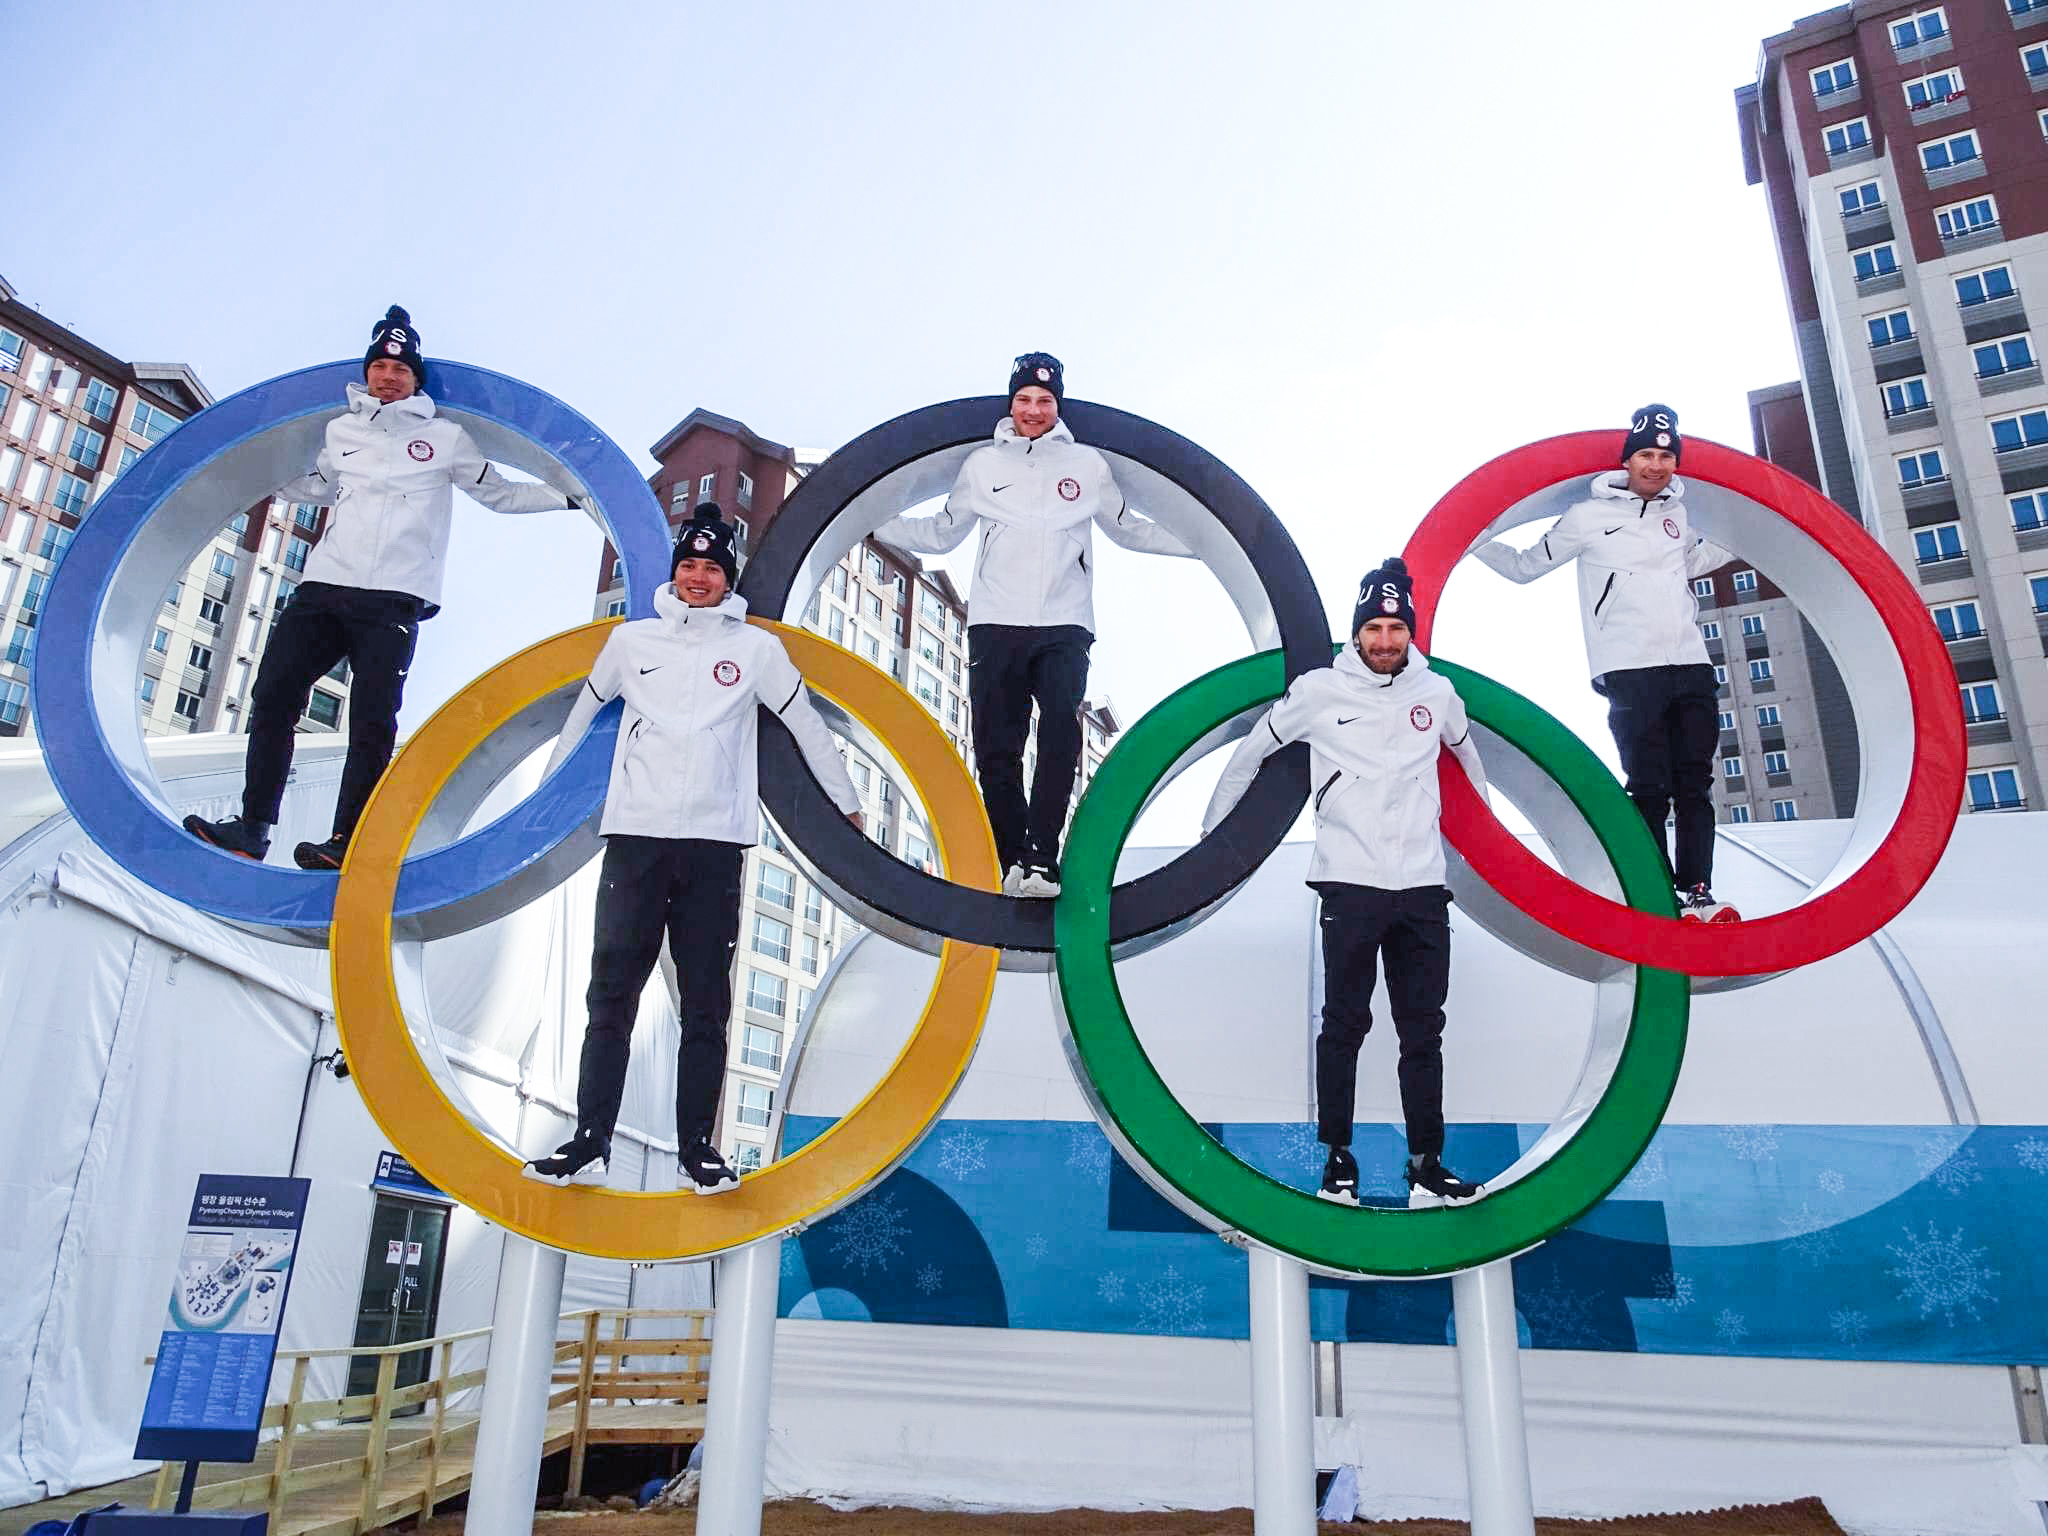 The Nordic Journey: Becoming An Olympian & Saying Goodbye to Pyeongchang